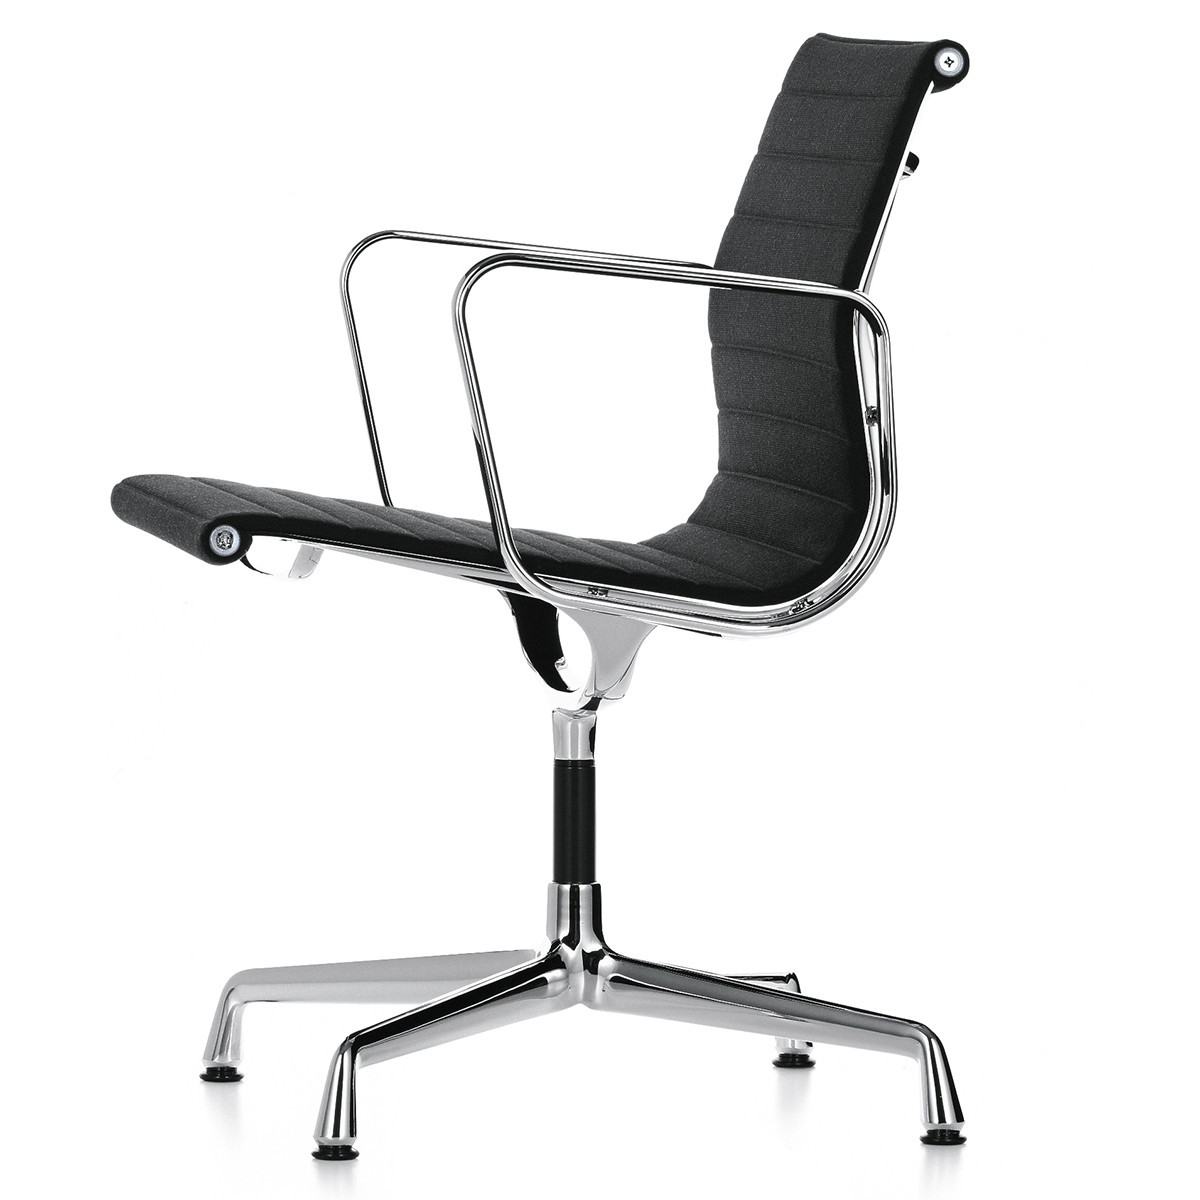 silla de conferencia EA108 Hopsack Hopsack (Tejida) Negro